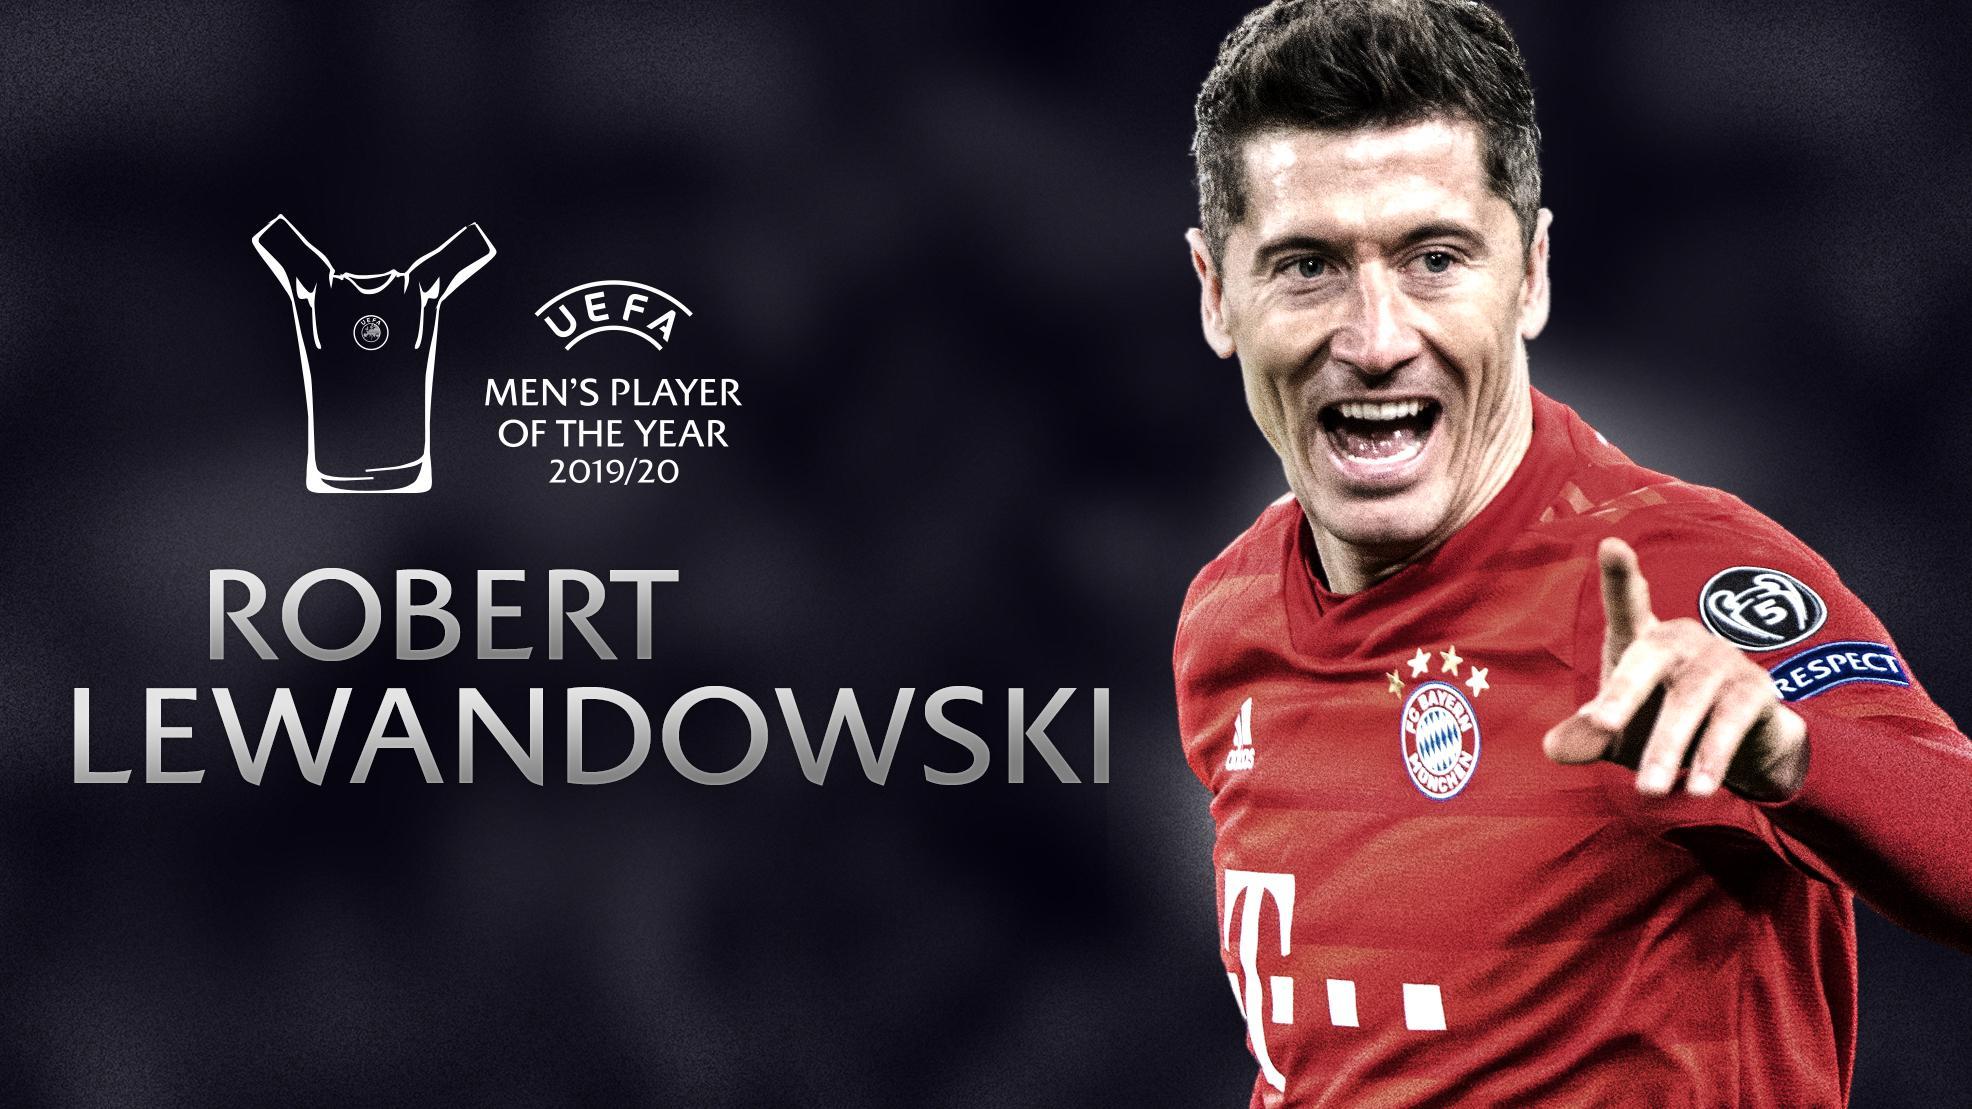 The case for Lewandowski